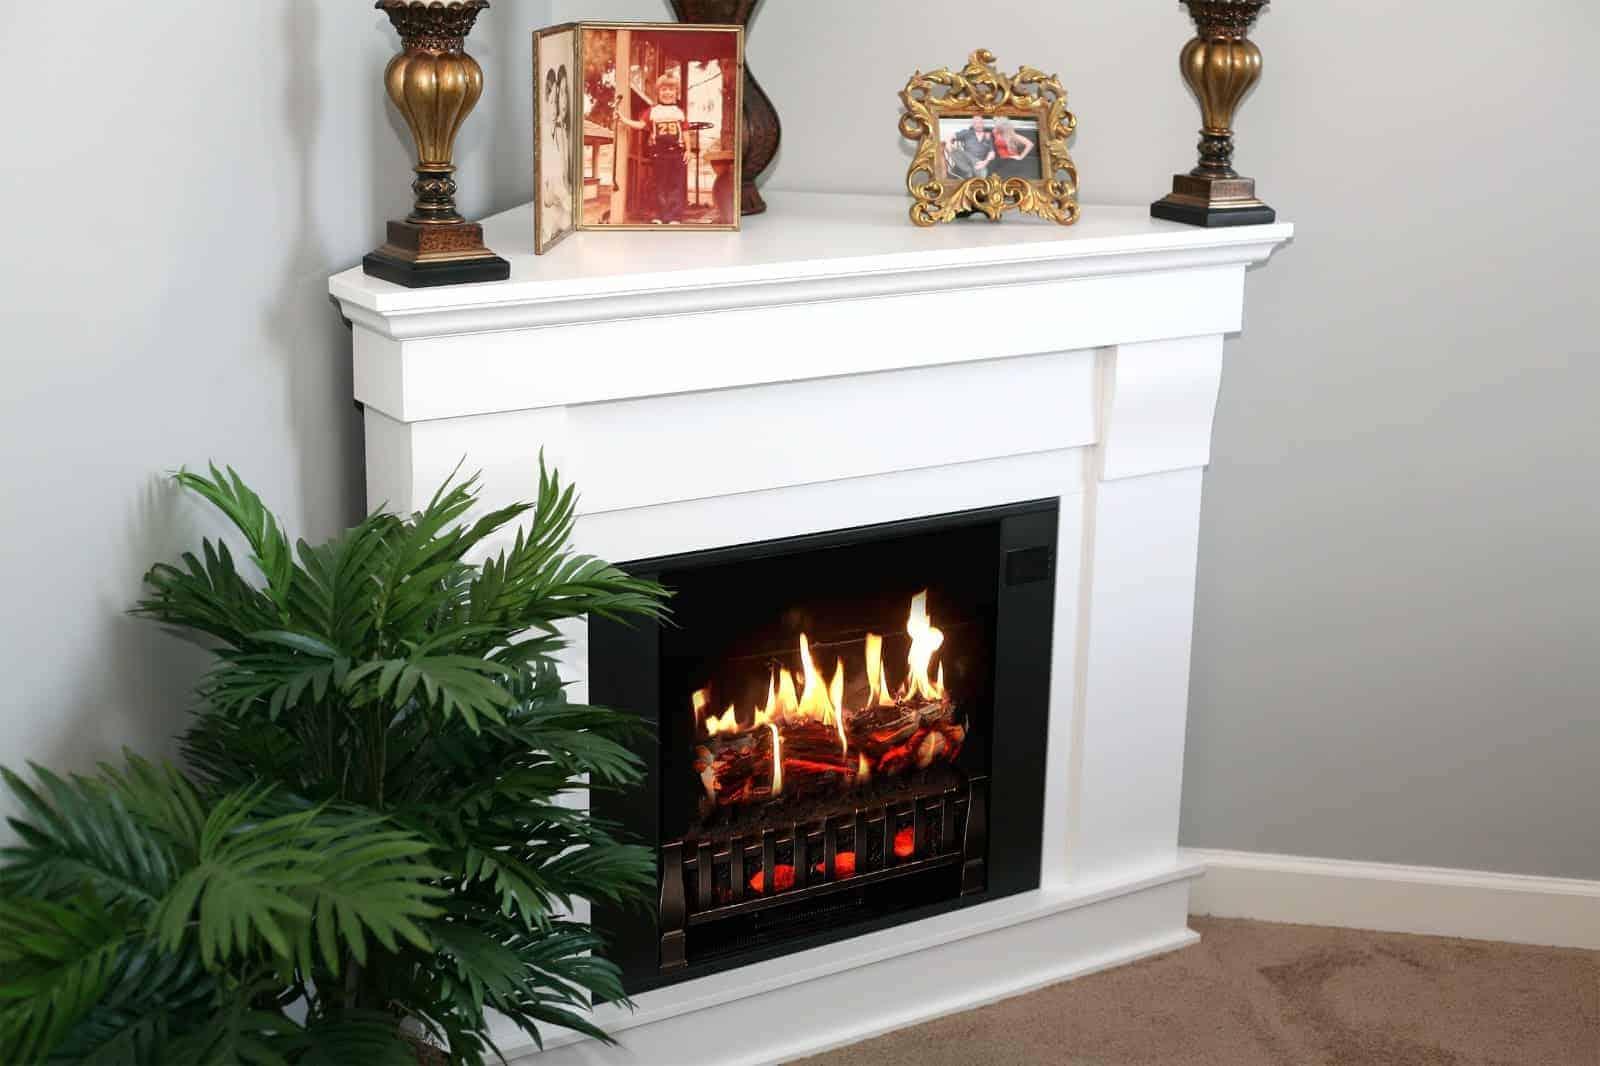 how to build a fireplace mantel shelf